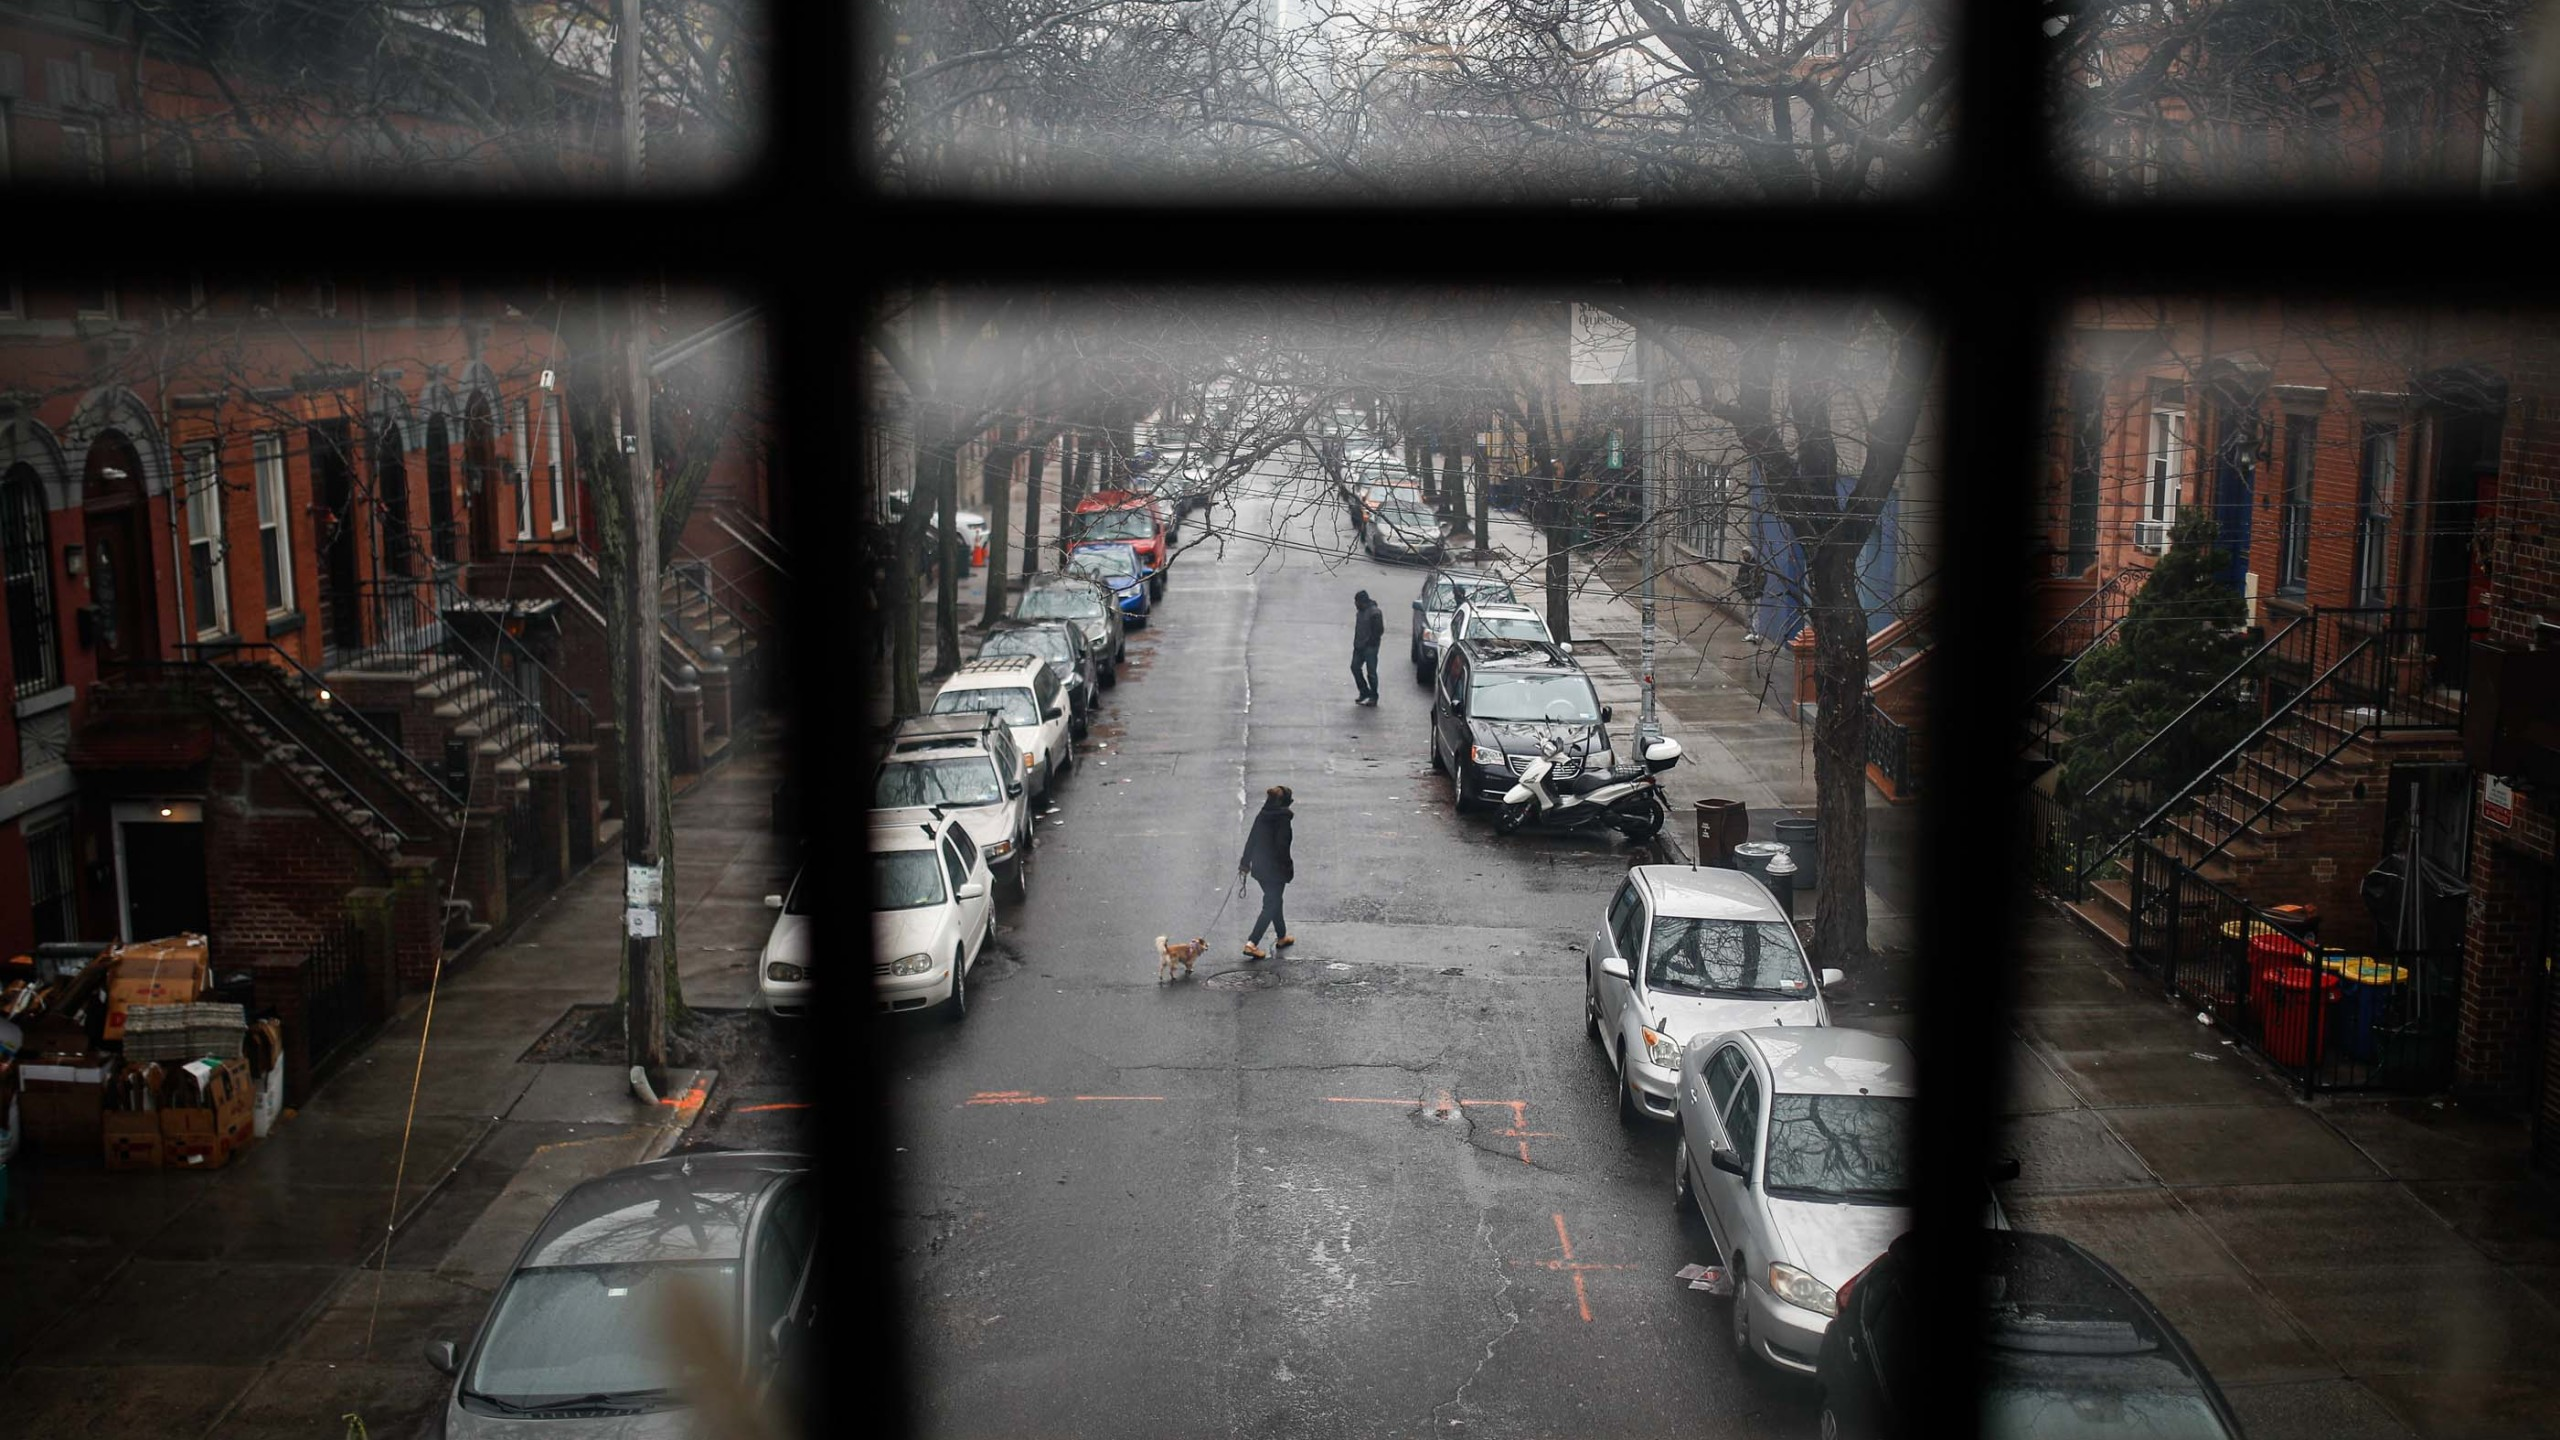 A pedestrian walks their dog through a quiet street, Tuesday, March 17, 2020, in the Brooklyn borough of New York. (AP Photo/John Minchillo)